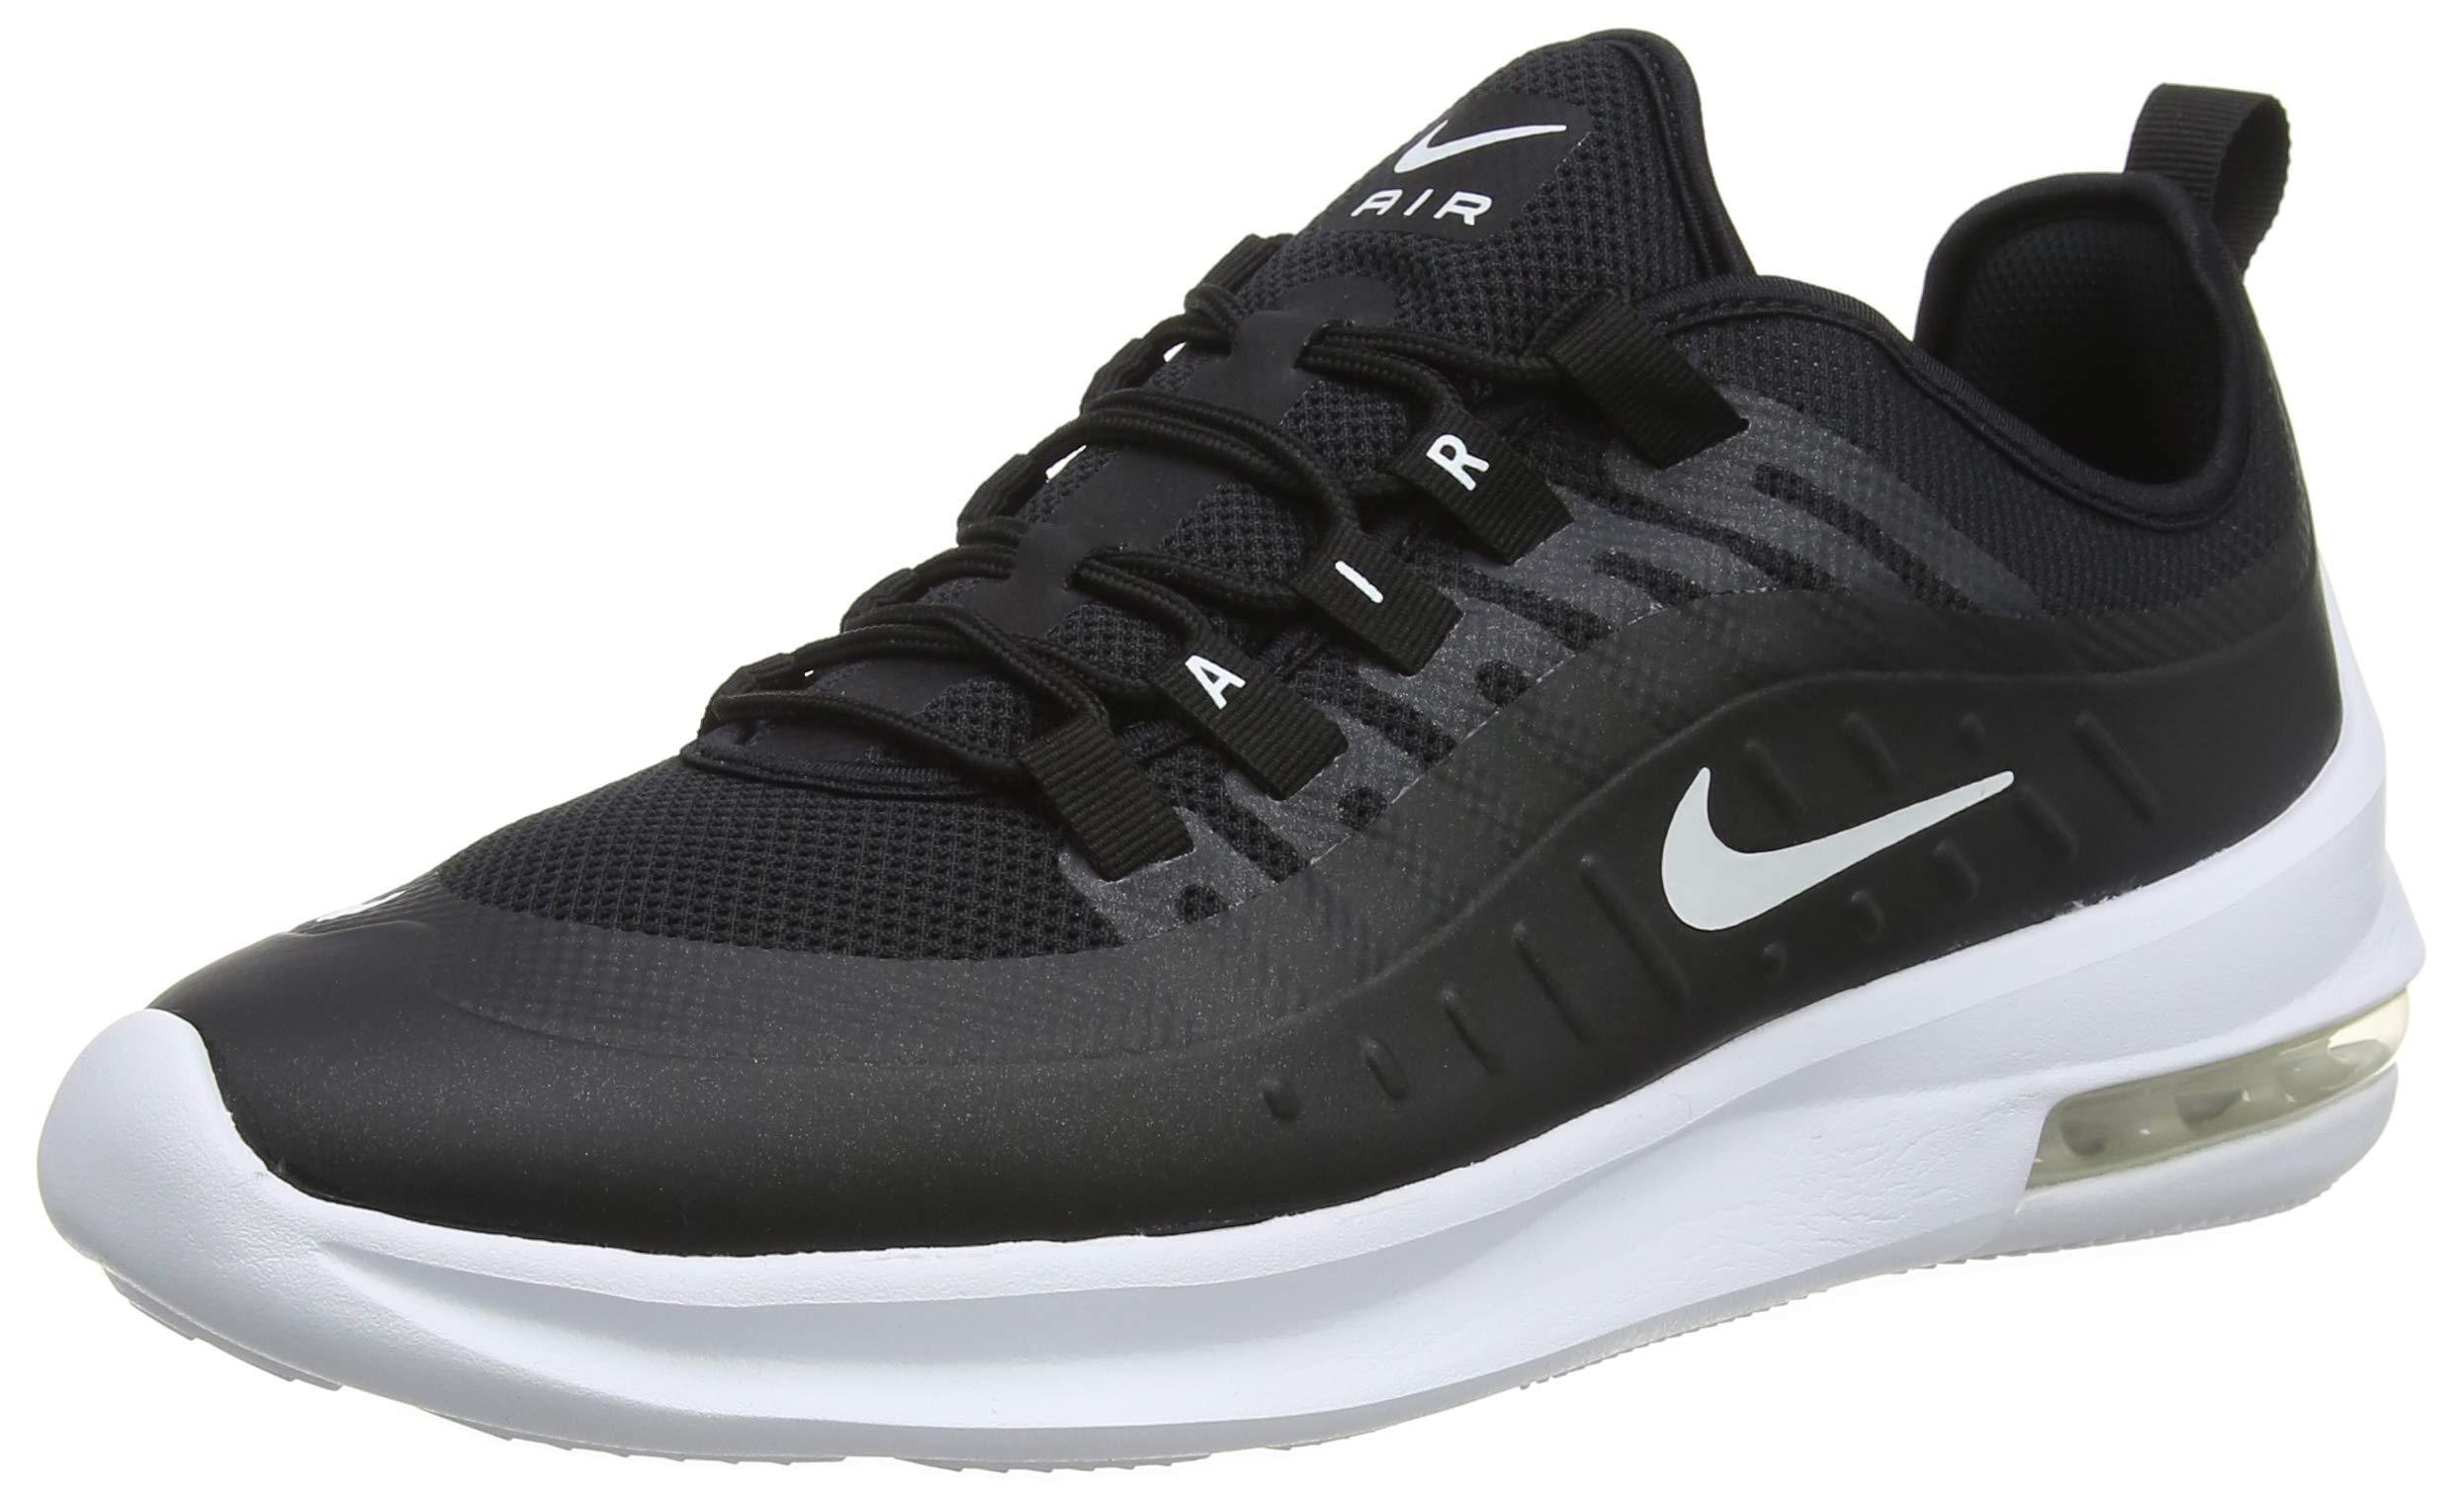 7843d8673a Galleon - Nike Air Max Axis Mens Aa2146-003 Size 7 Black/White